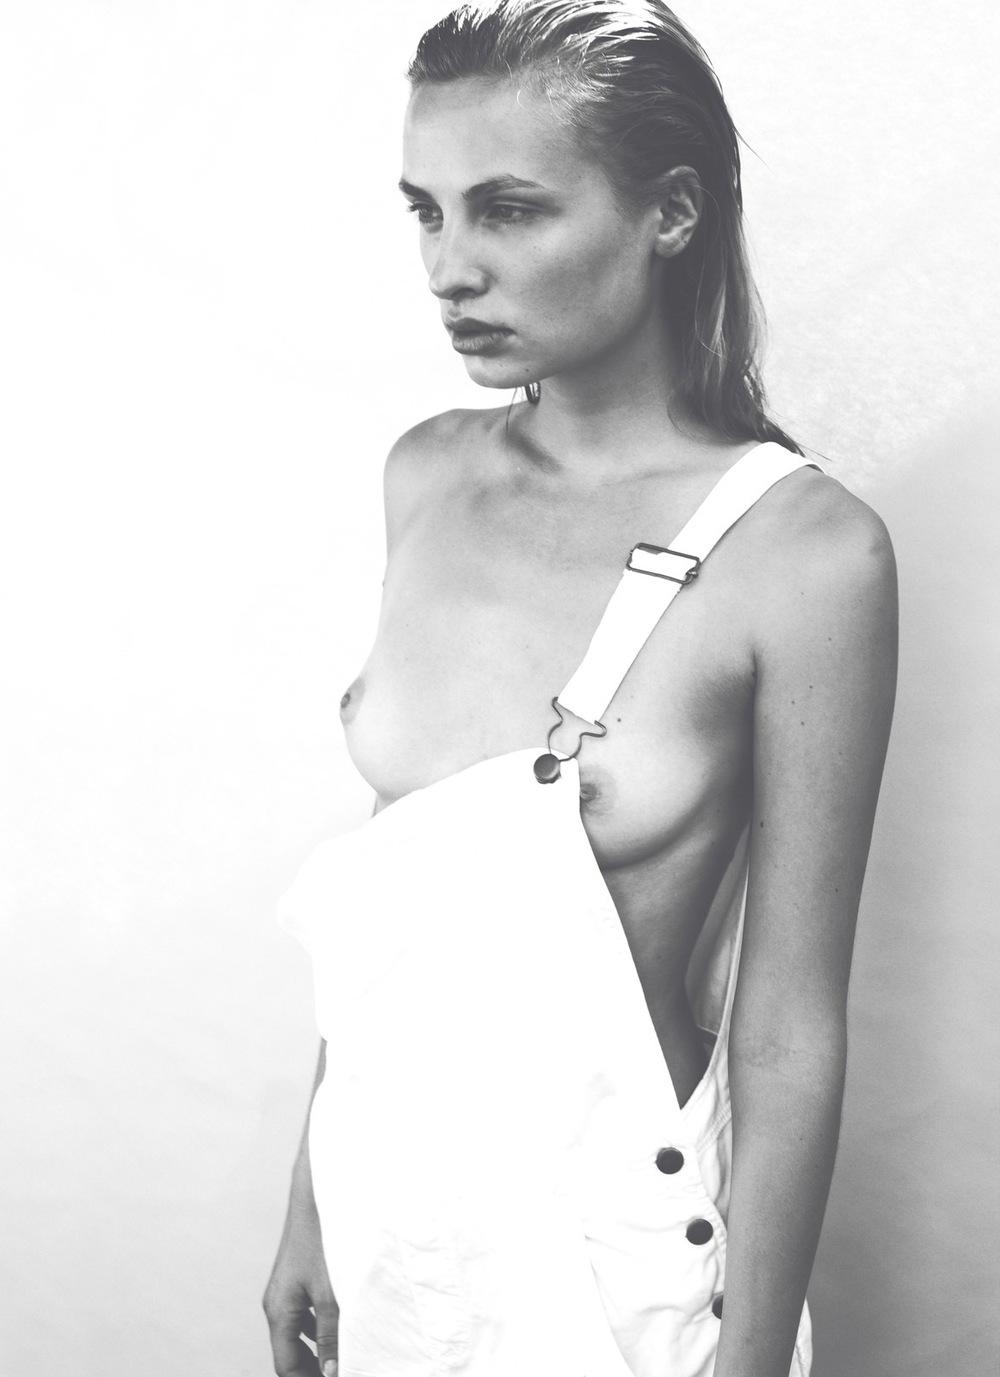 Miriam_Adler-Tess_Feuilhade-01.jpeg